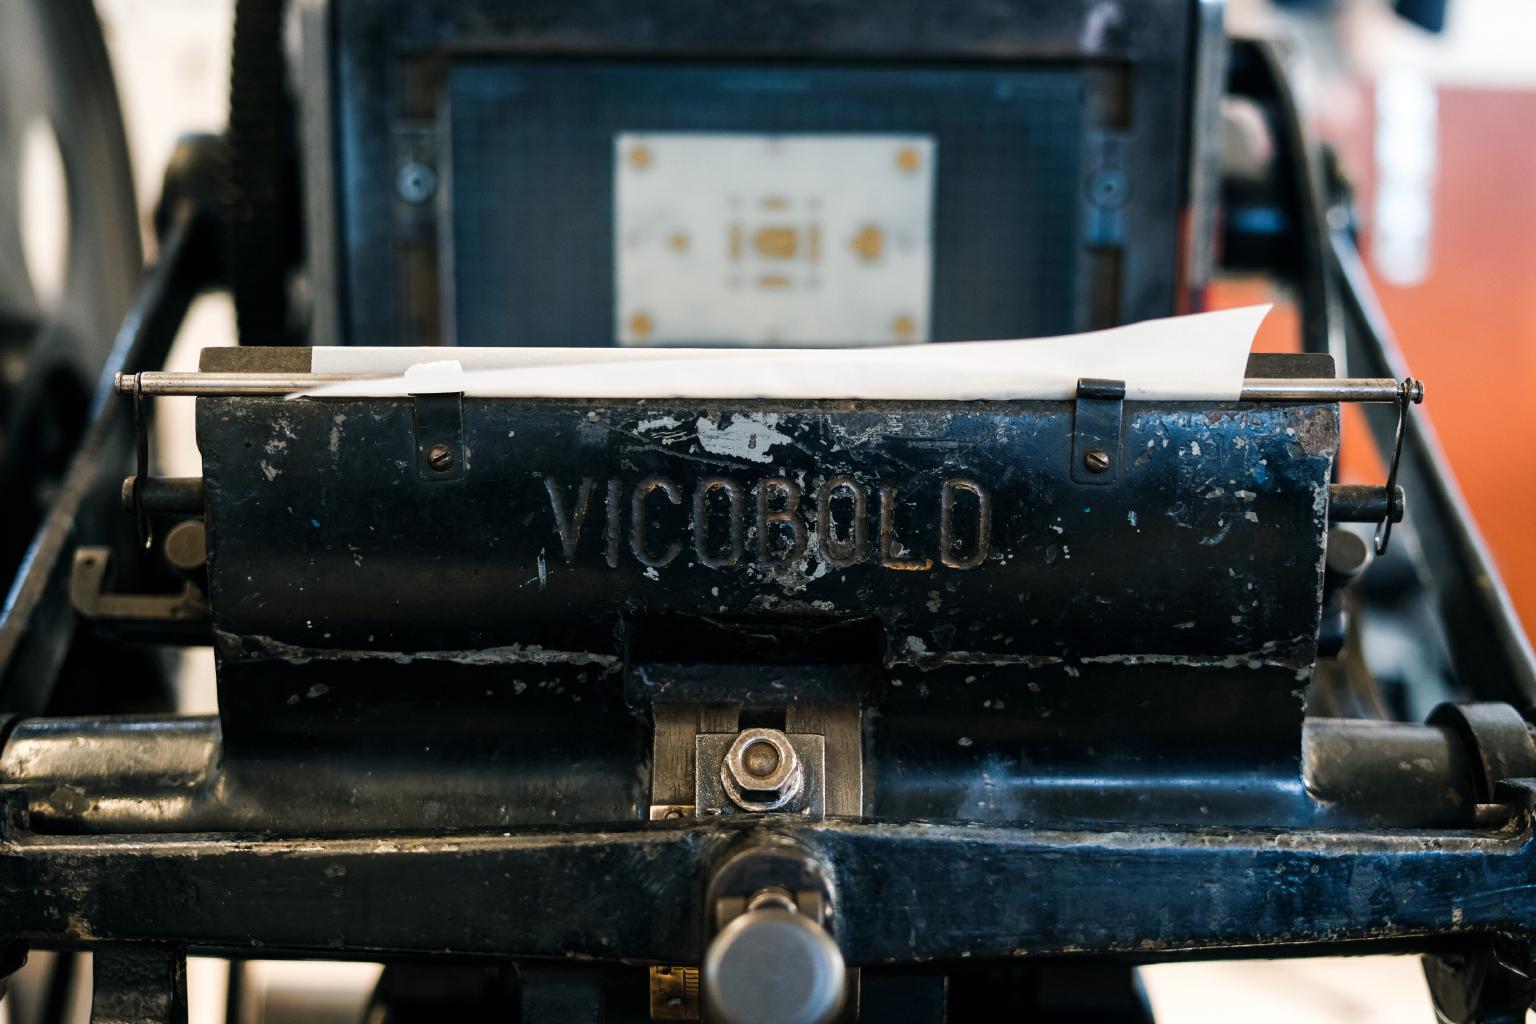 The 'Beast' - a 1950's Vicobold printing press